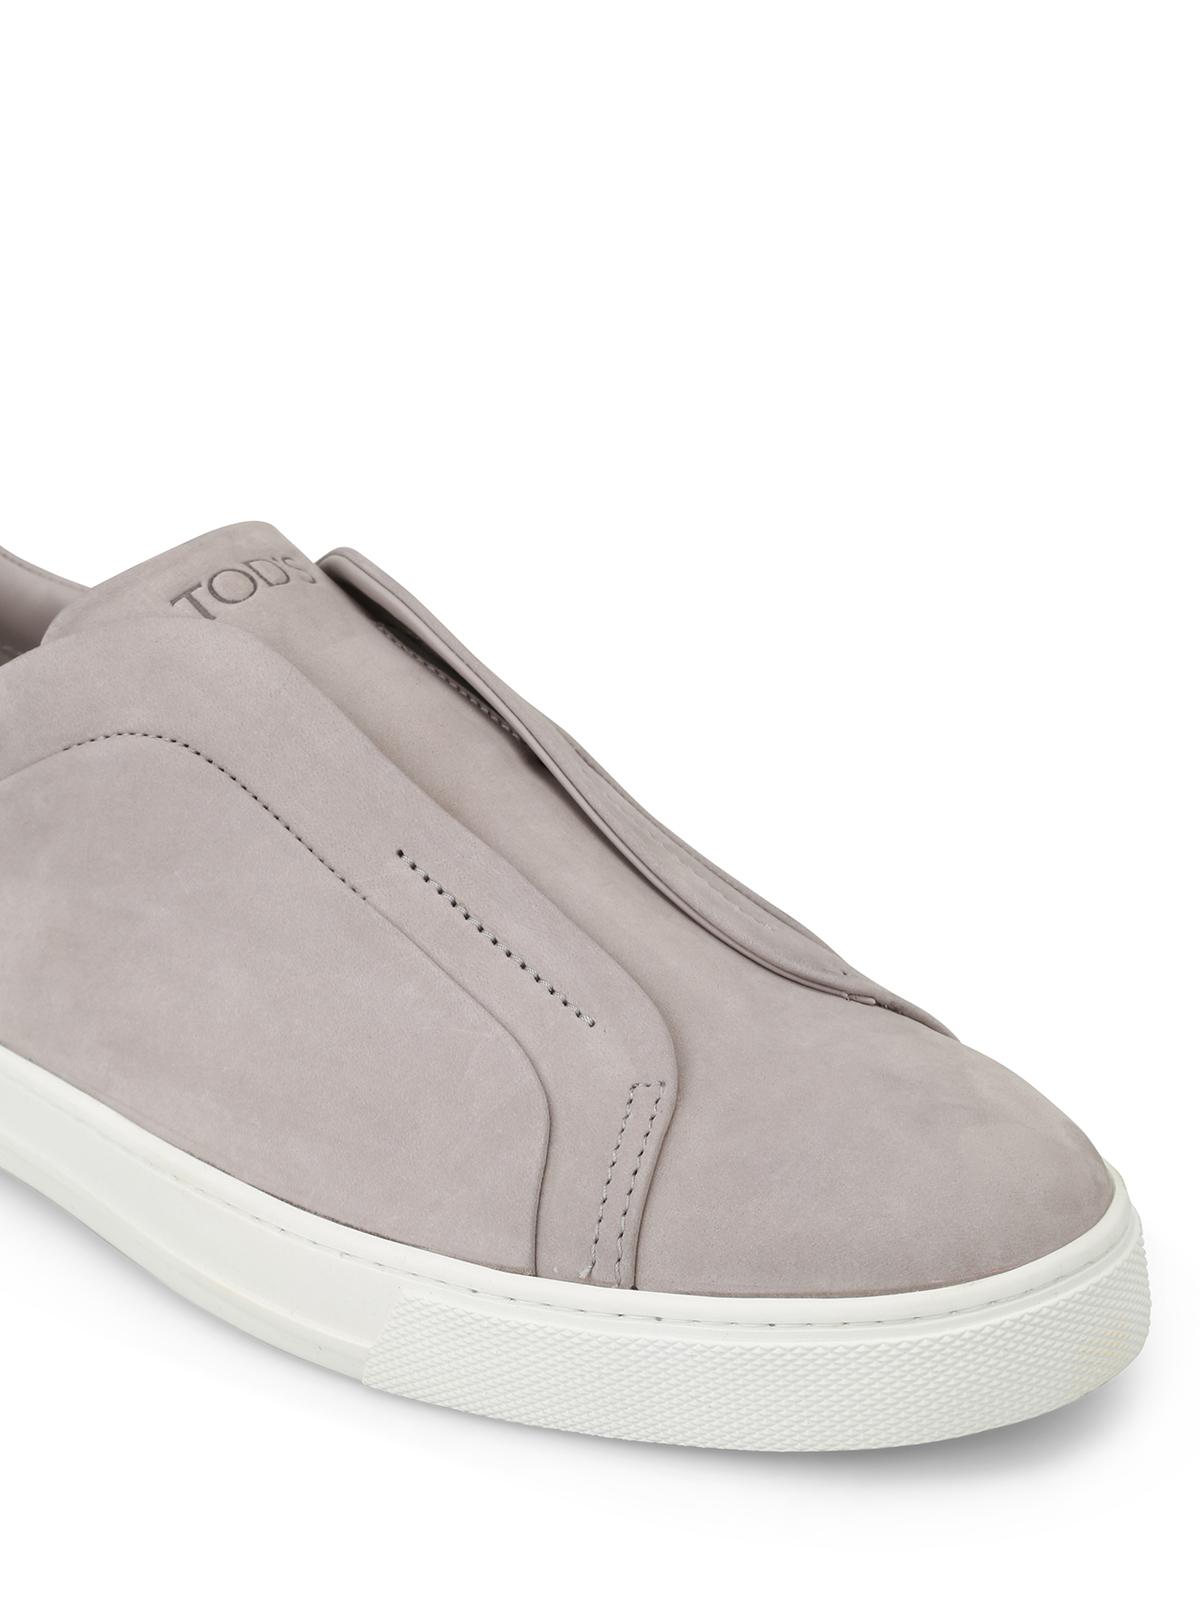 Tod'S - Light grey nubuck slip-ons